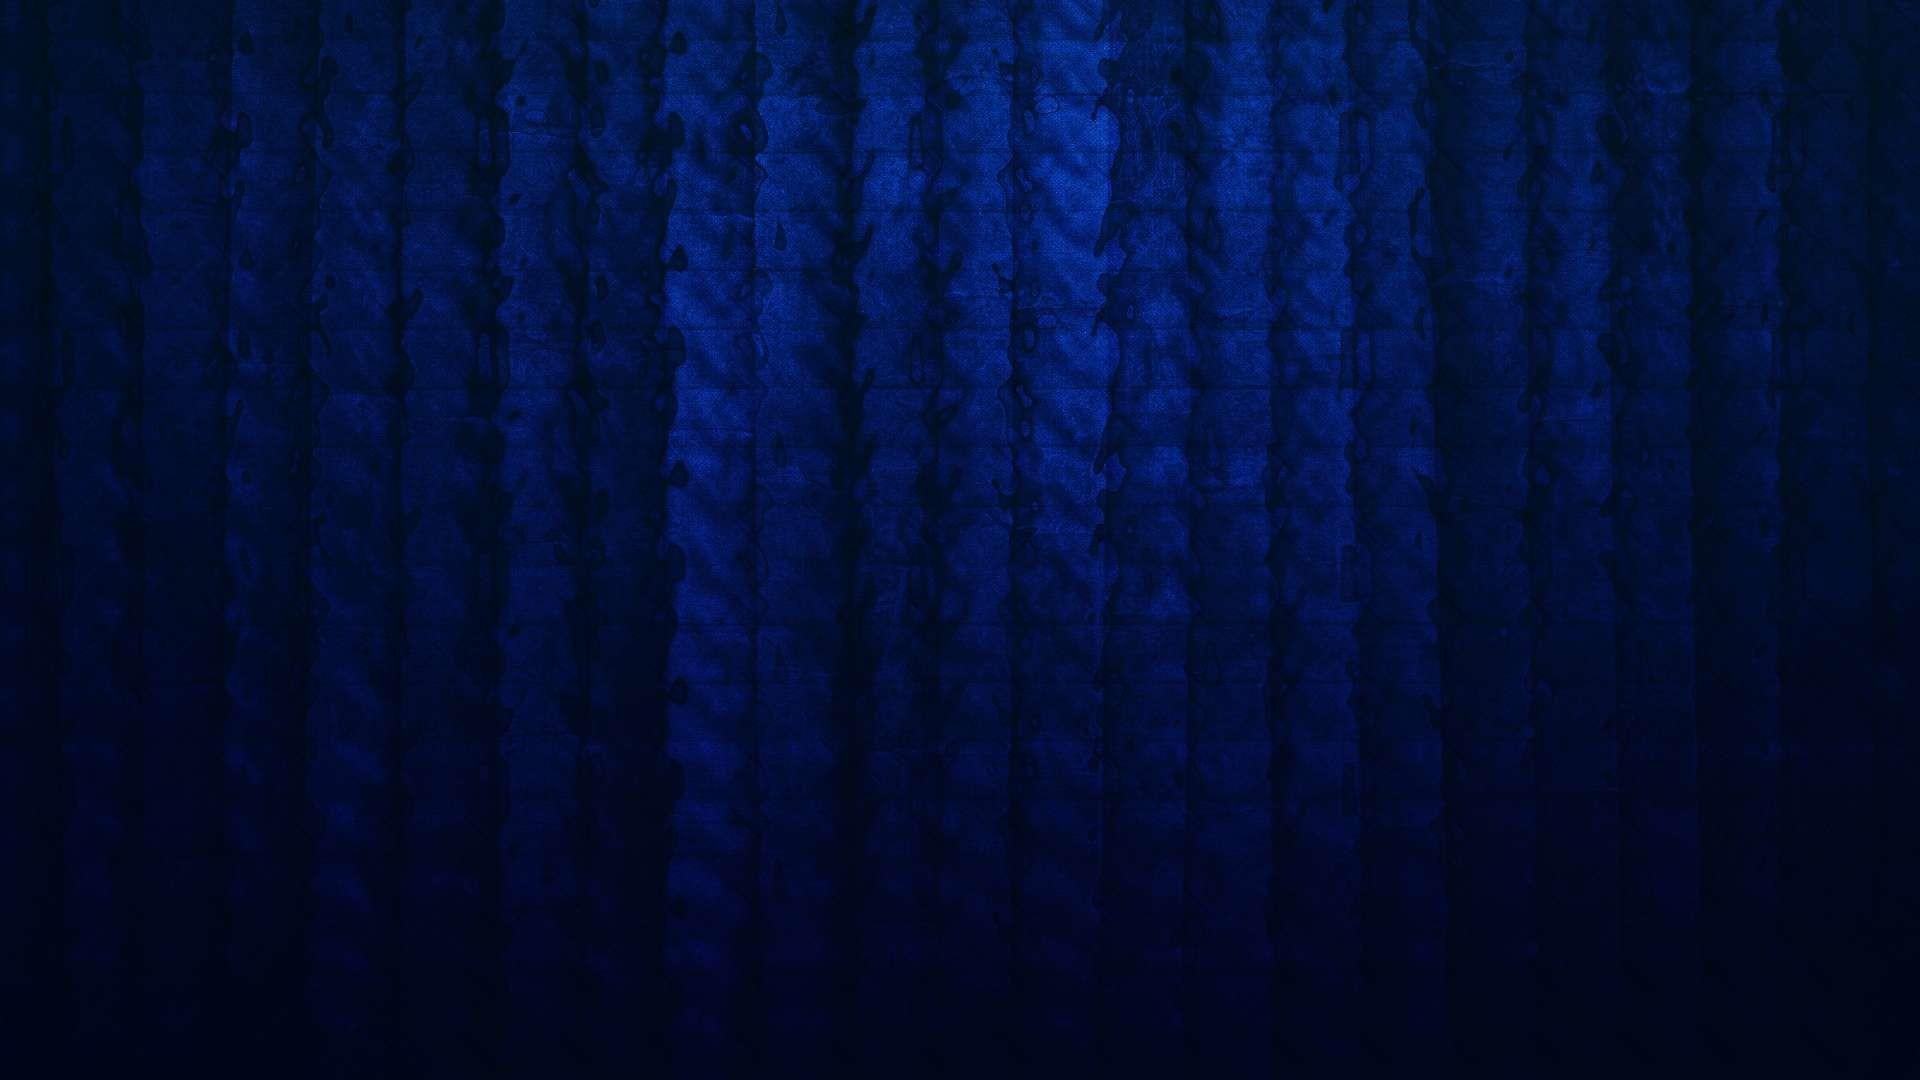 Dark Blue hd Wallpapers 1080p Dark hd Wallpaper 1080p